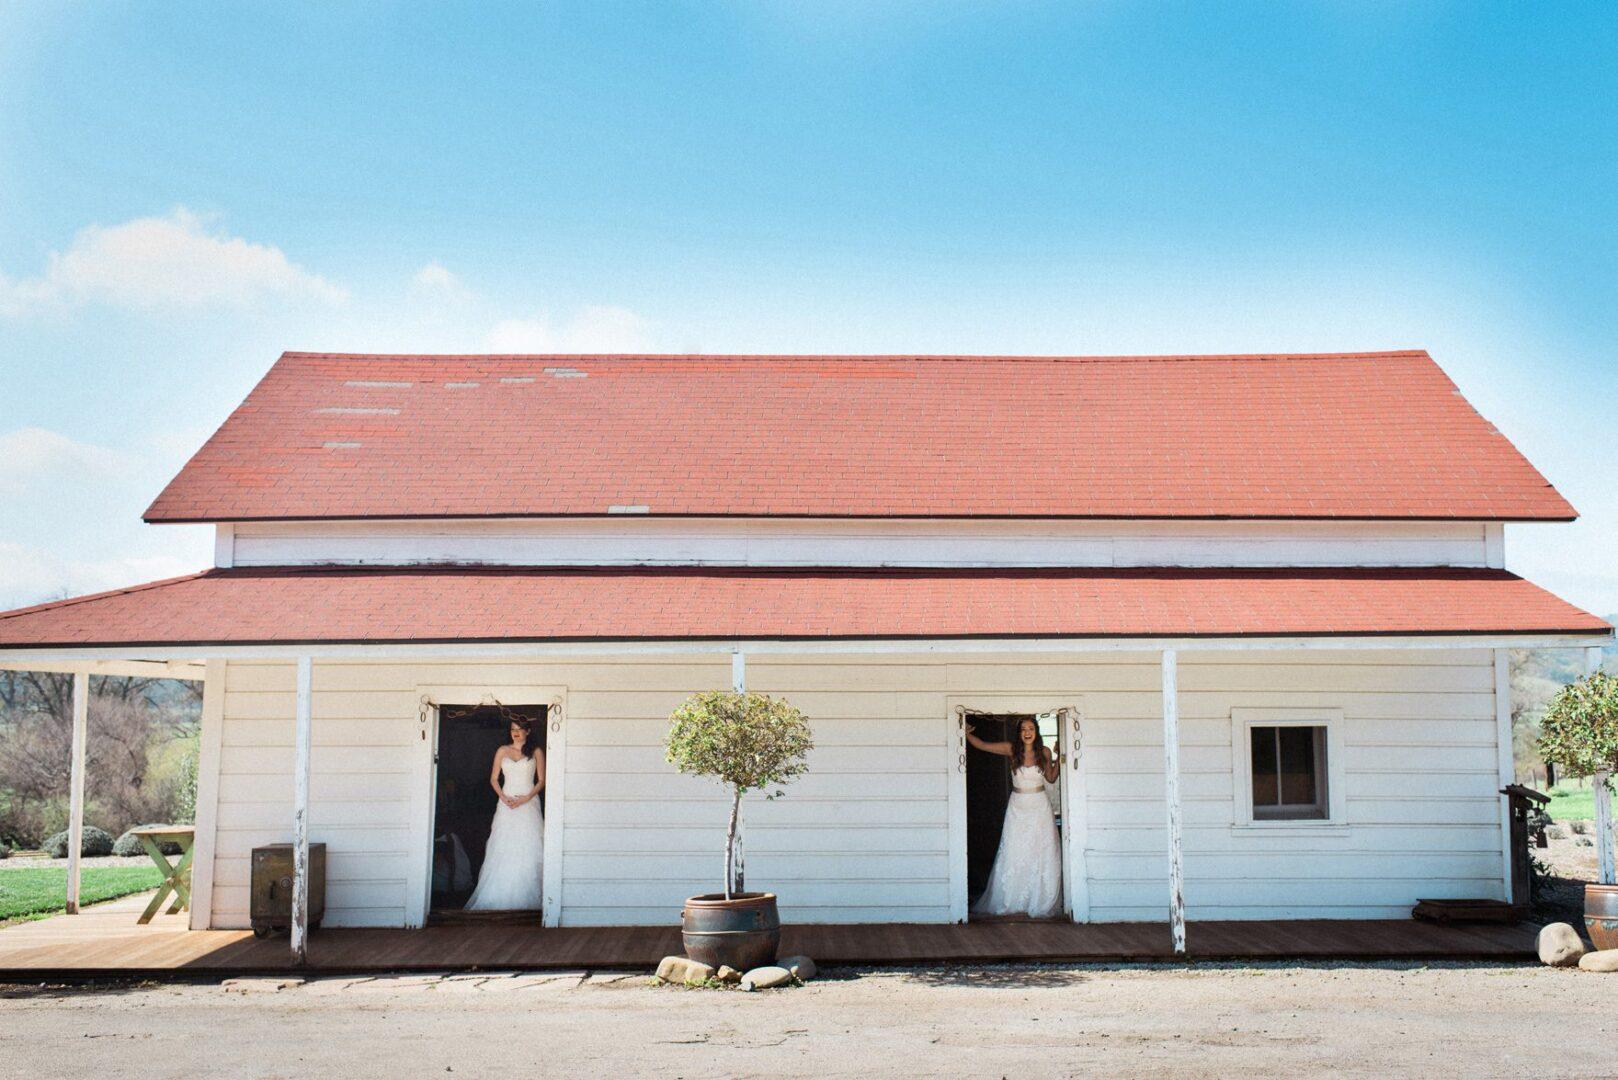 California-Santa-Margarita-Ranch-destination--Saint-Louis-Obispo-wedding-photographer-christina-lilly-photography019